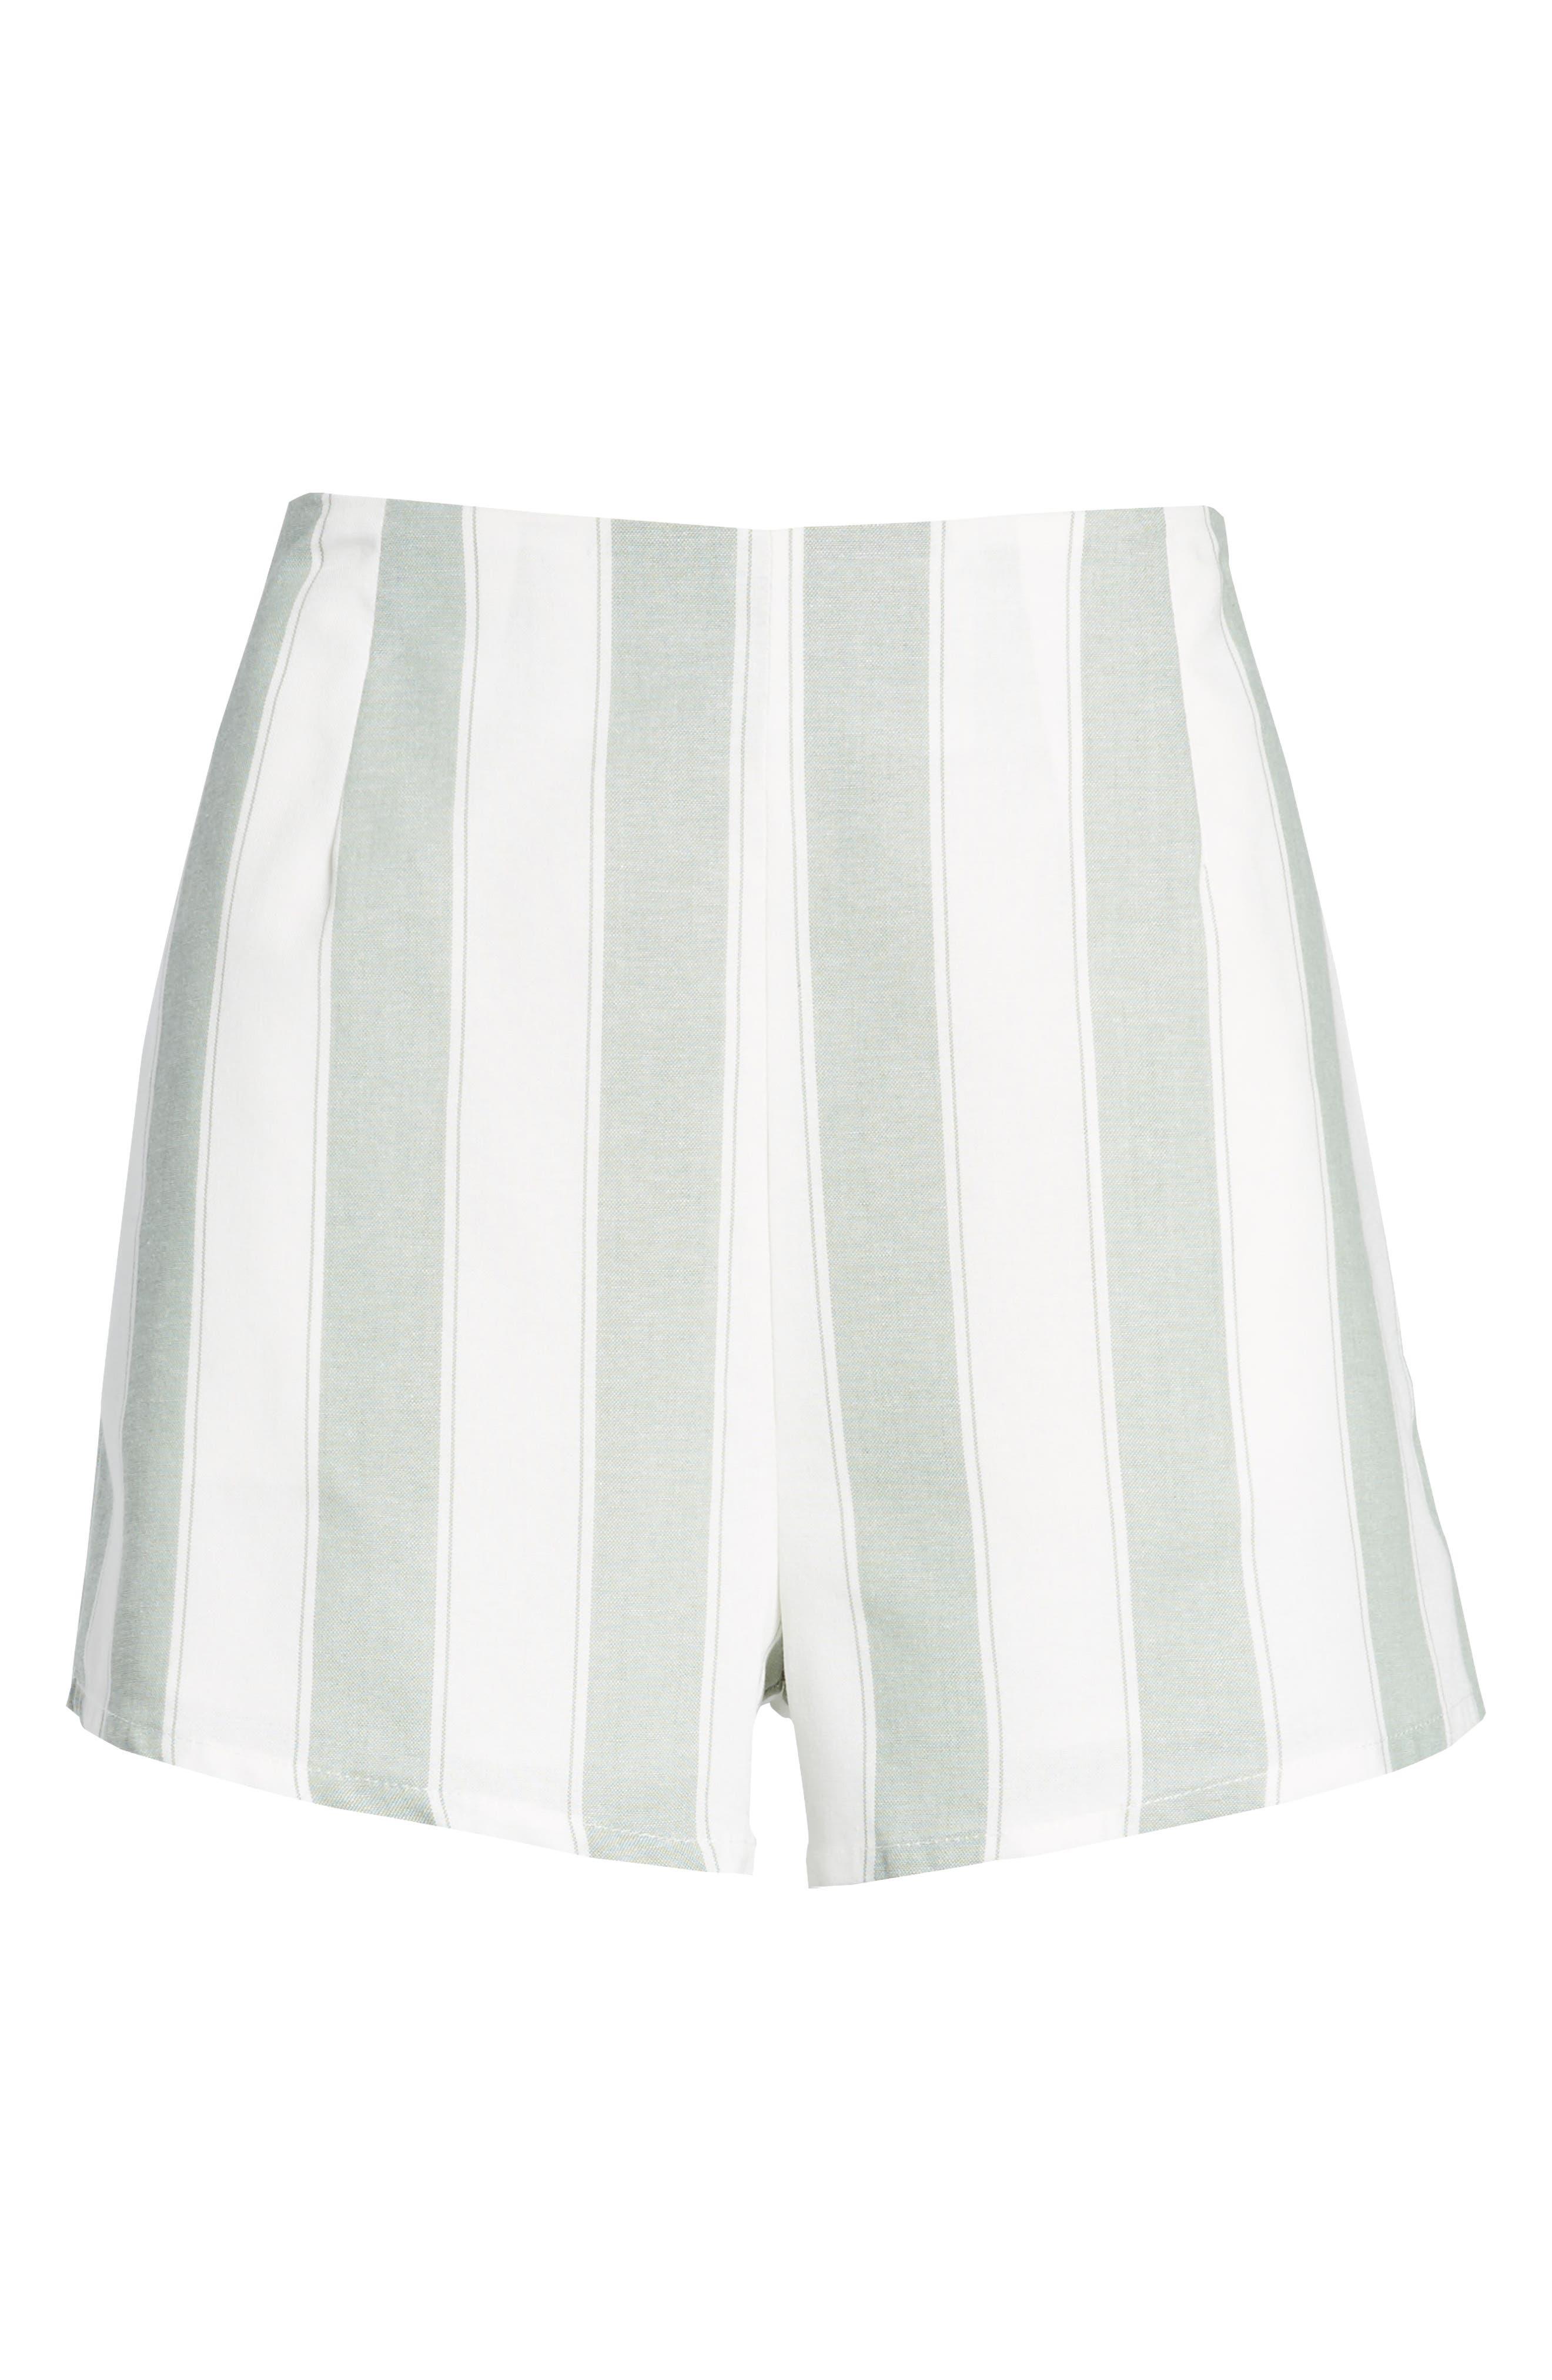 Poetic Stripe Shorts,                             Alternate thumbnail 6, color,